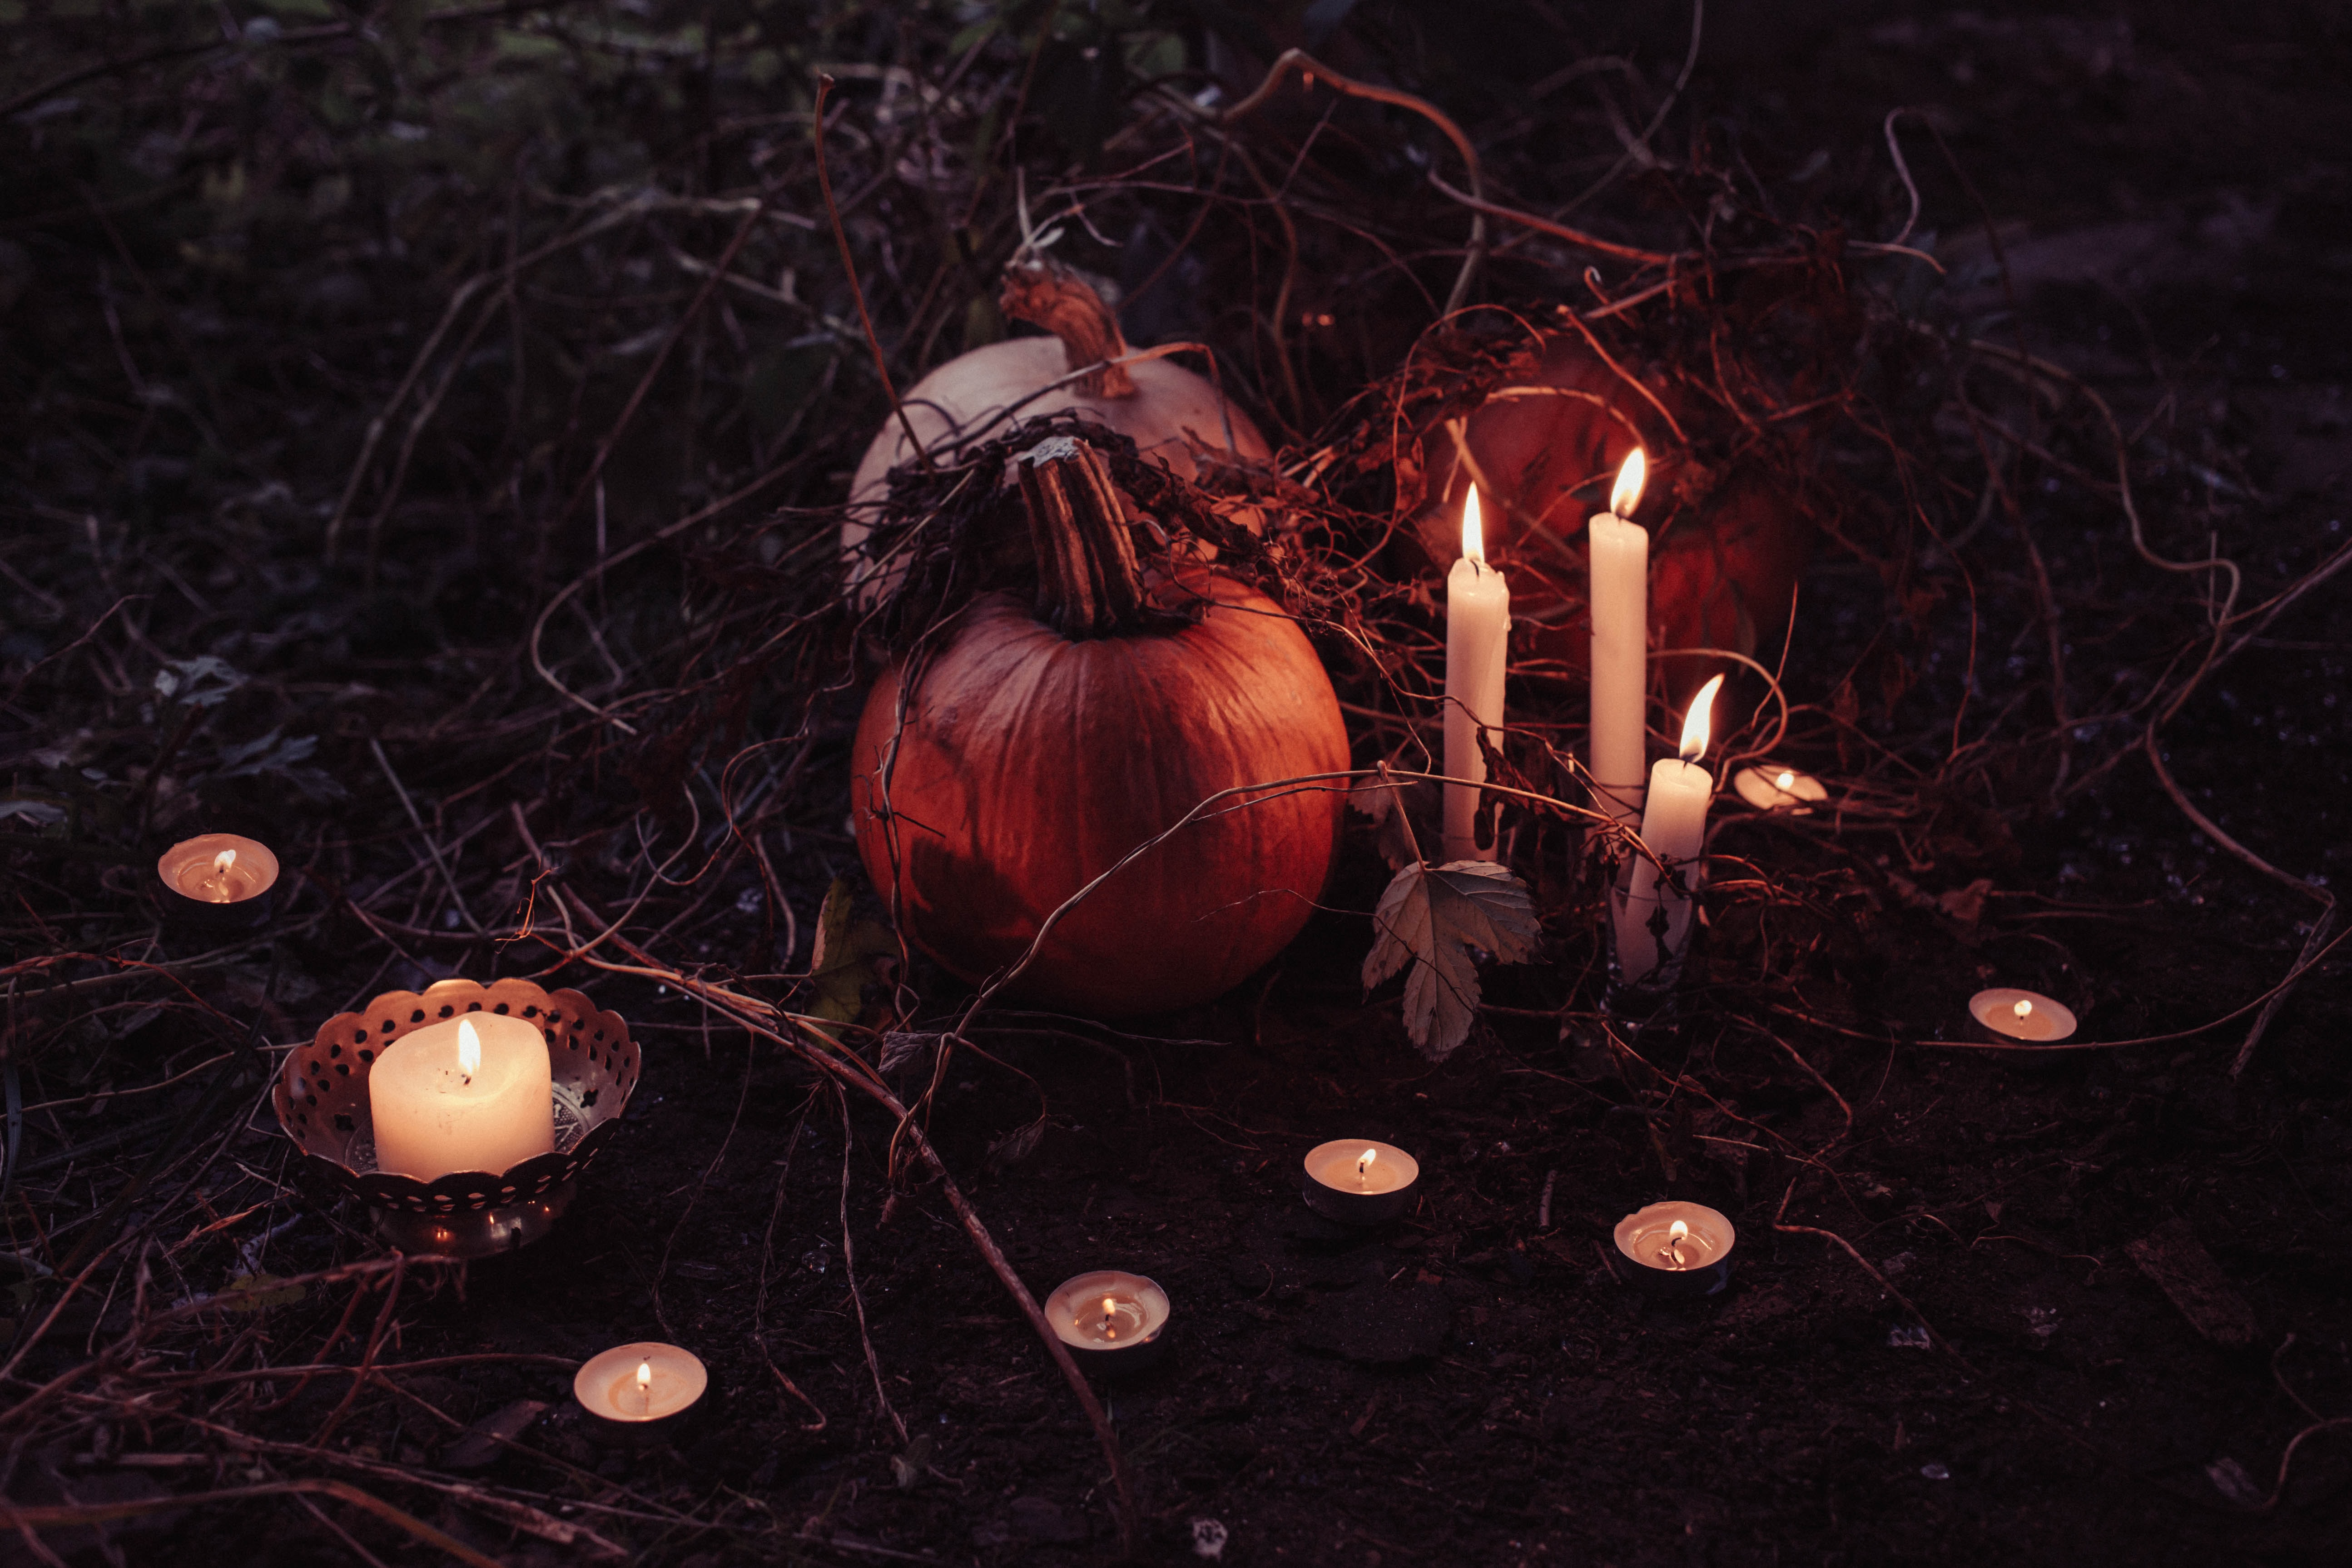 Prague, Candles, Cemetery, Europe, Experience, Halloween, Pumpkin, Festival, Spooky, Autumn, Travel, LocalBini, BiniBlog